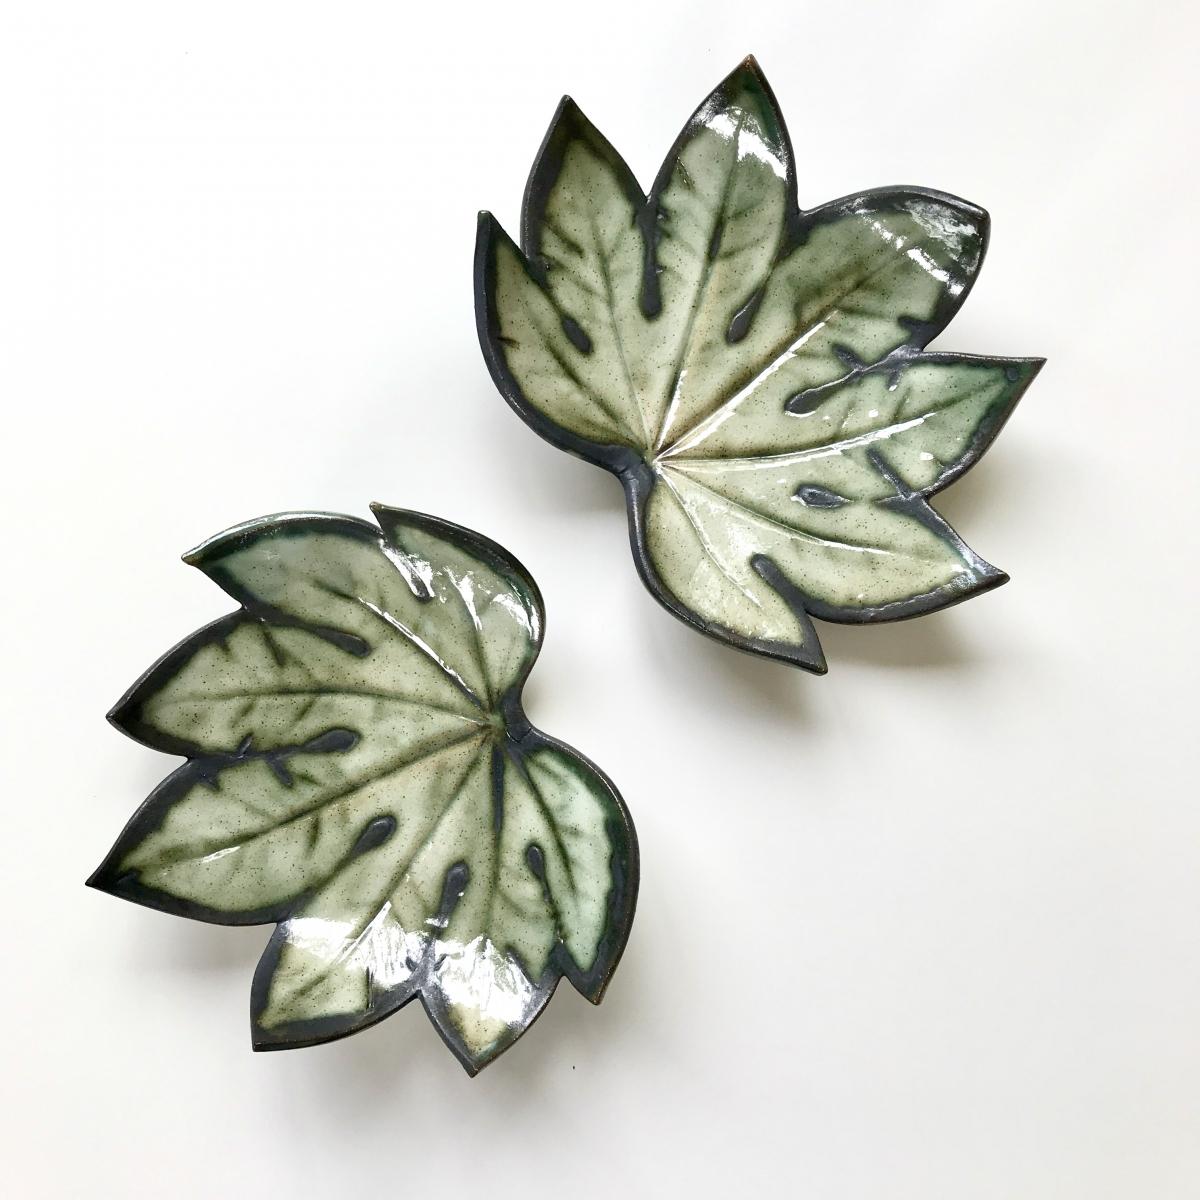 Rustic Green Trinket Dish by Sonya Ceramic Art